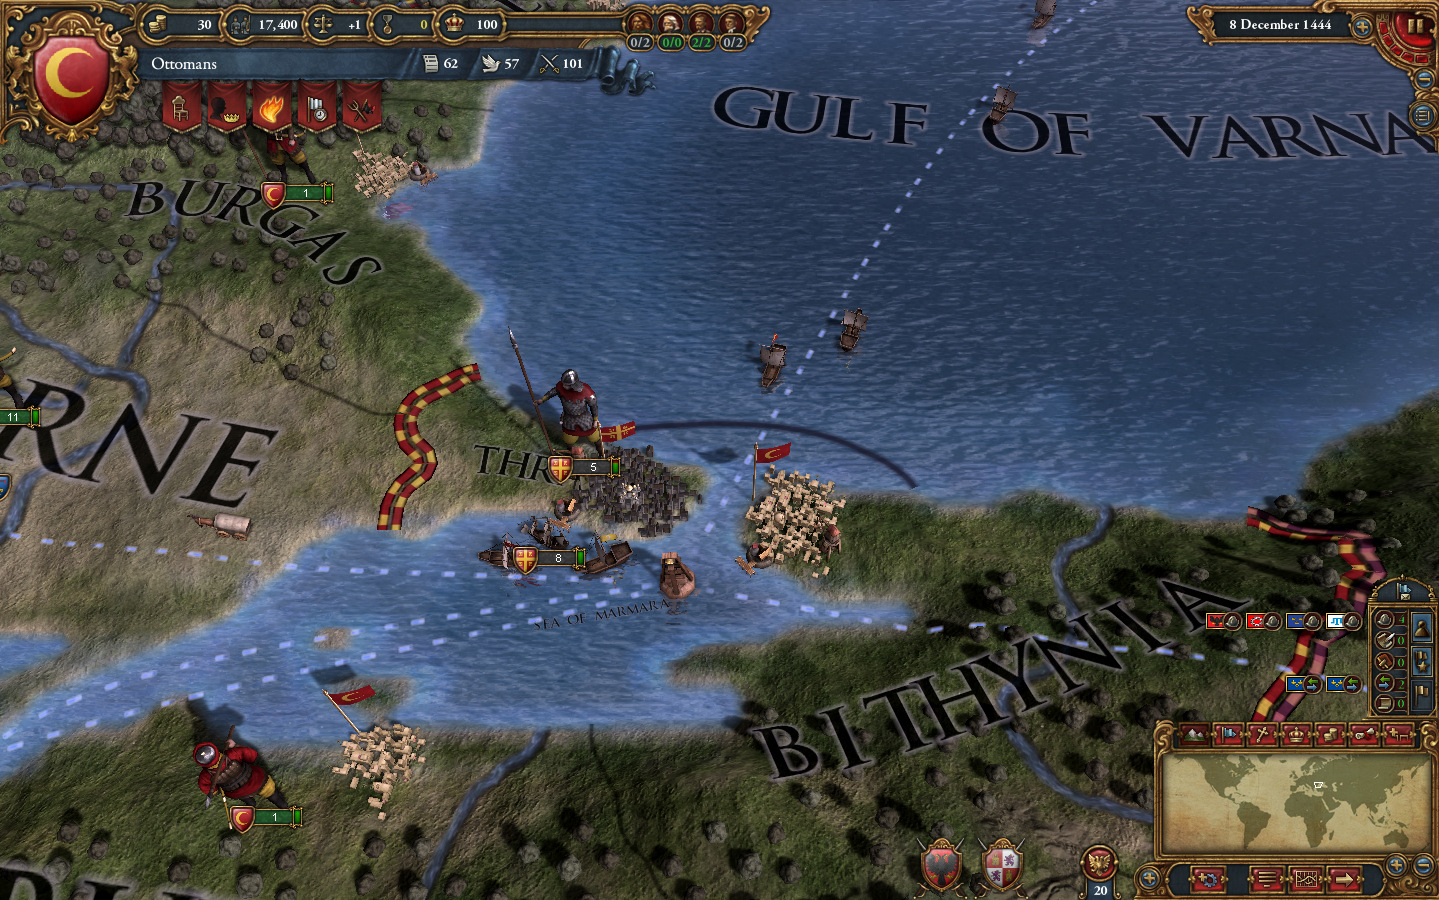 Europa universalis 4 дипломатическая репутация - 1